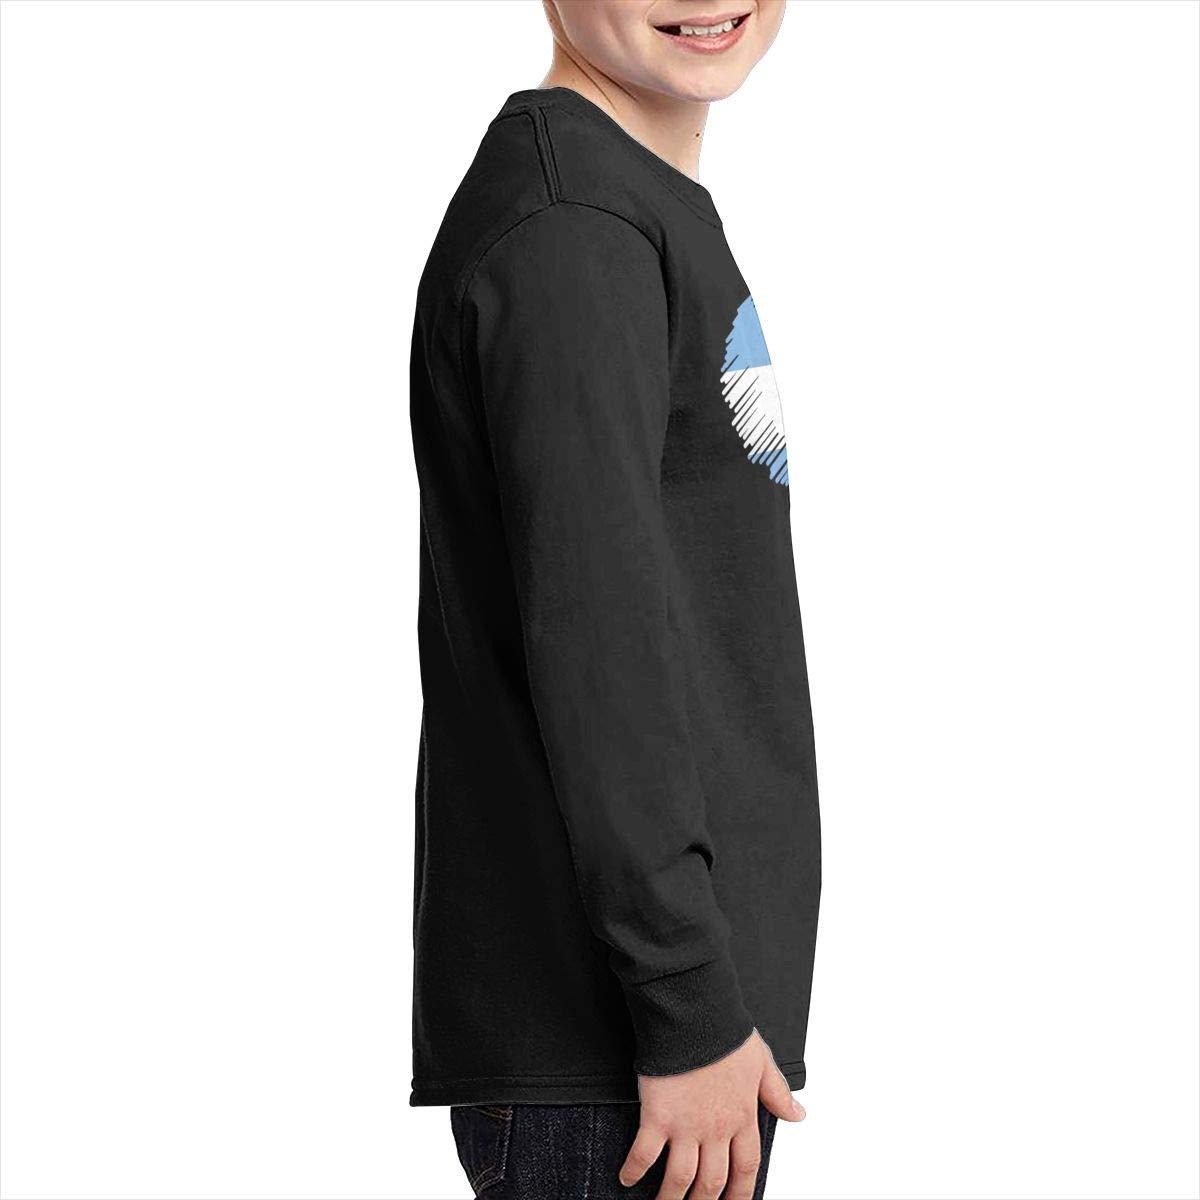 Teenager Argentina Flag in Heart Shape ComfortSoft Long Sleeve Tee